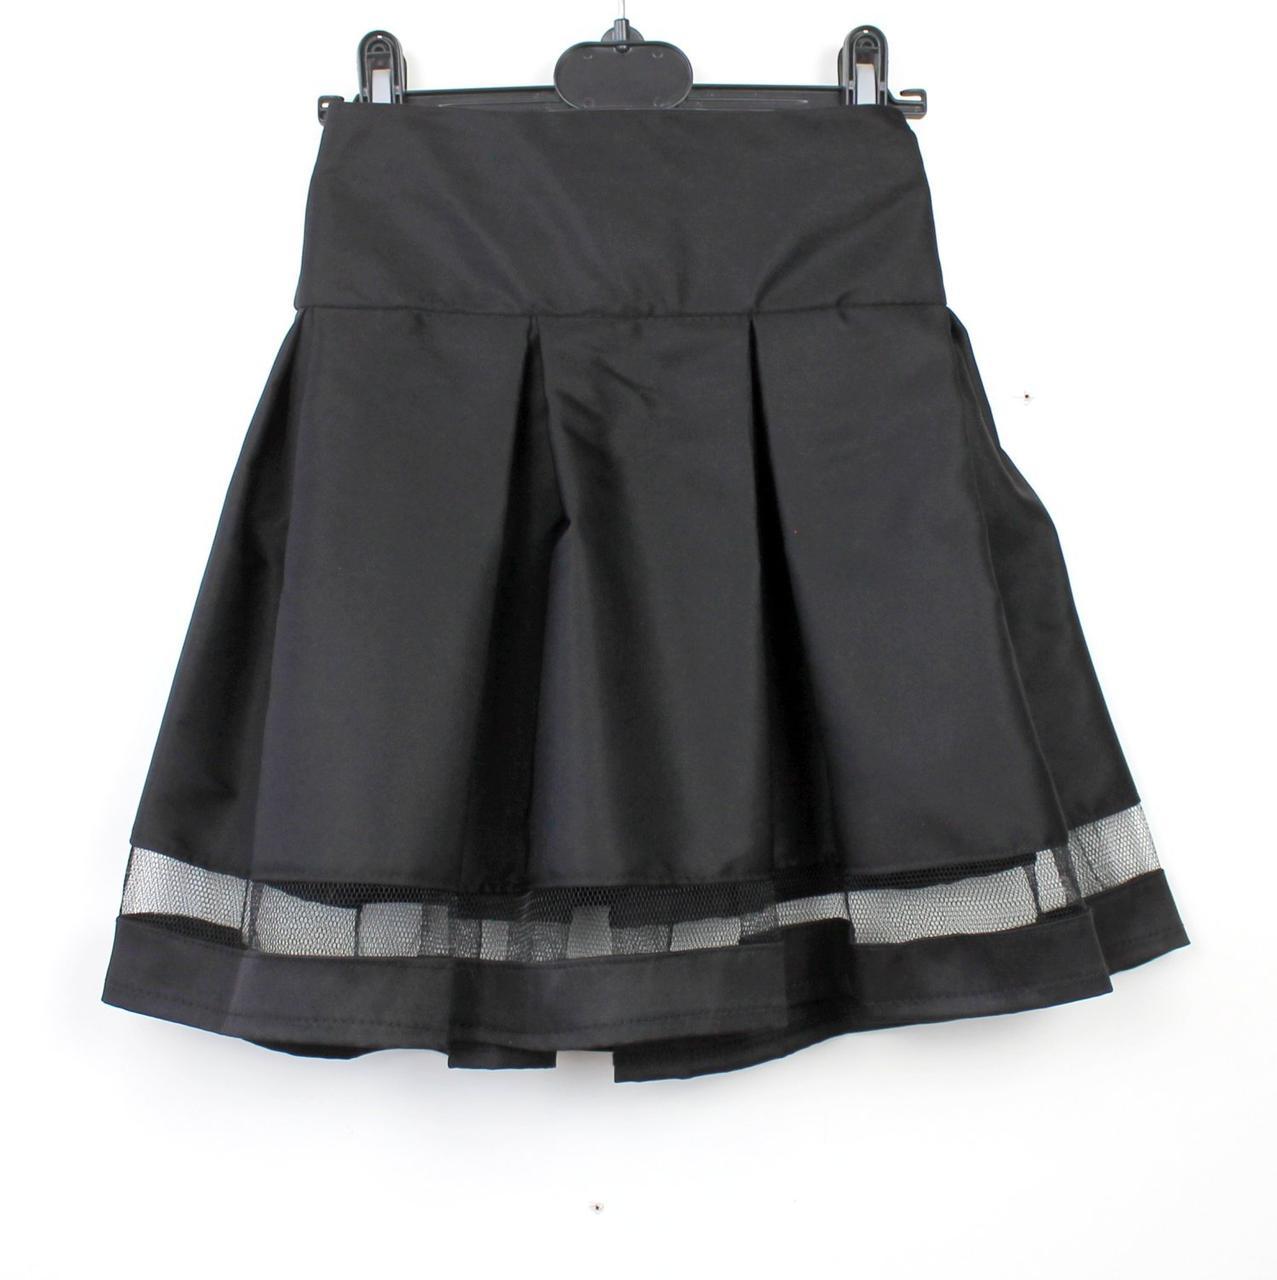 Юбка  черная школьная Шанель тм Vdags  размер 122,134